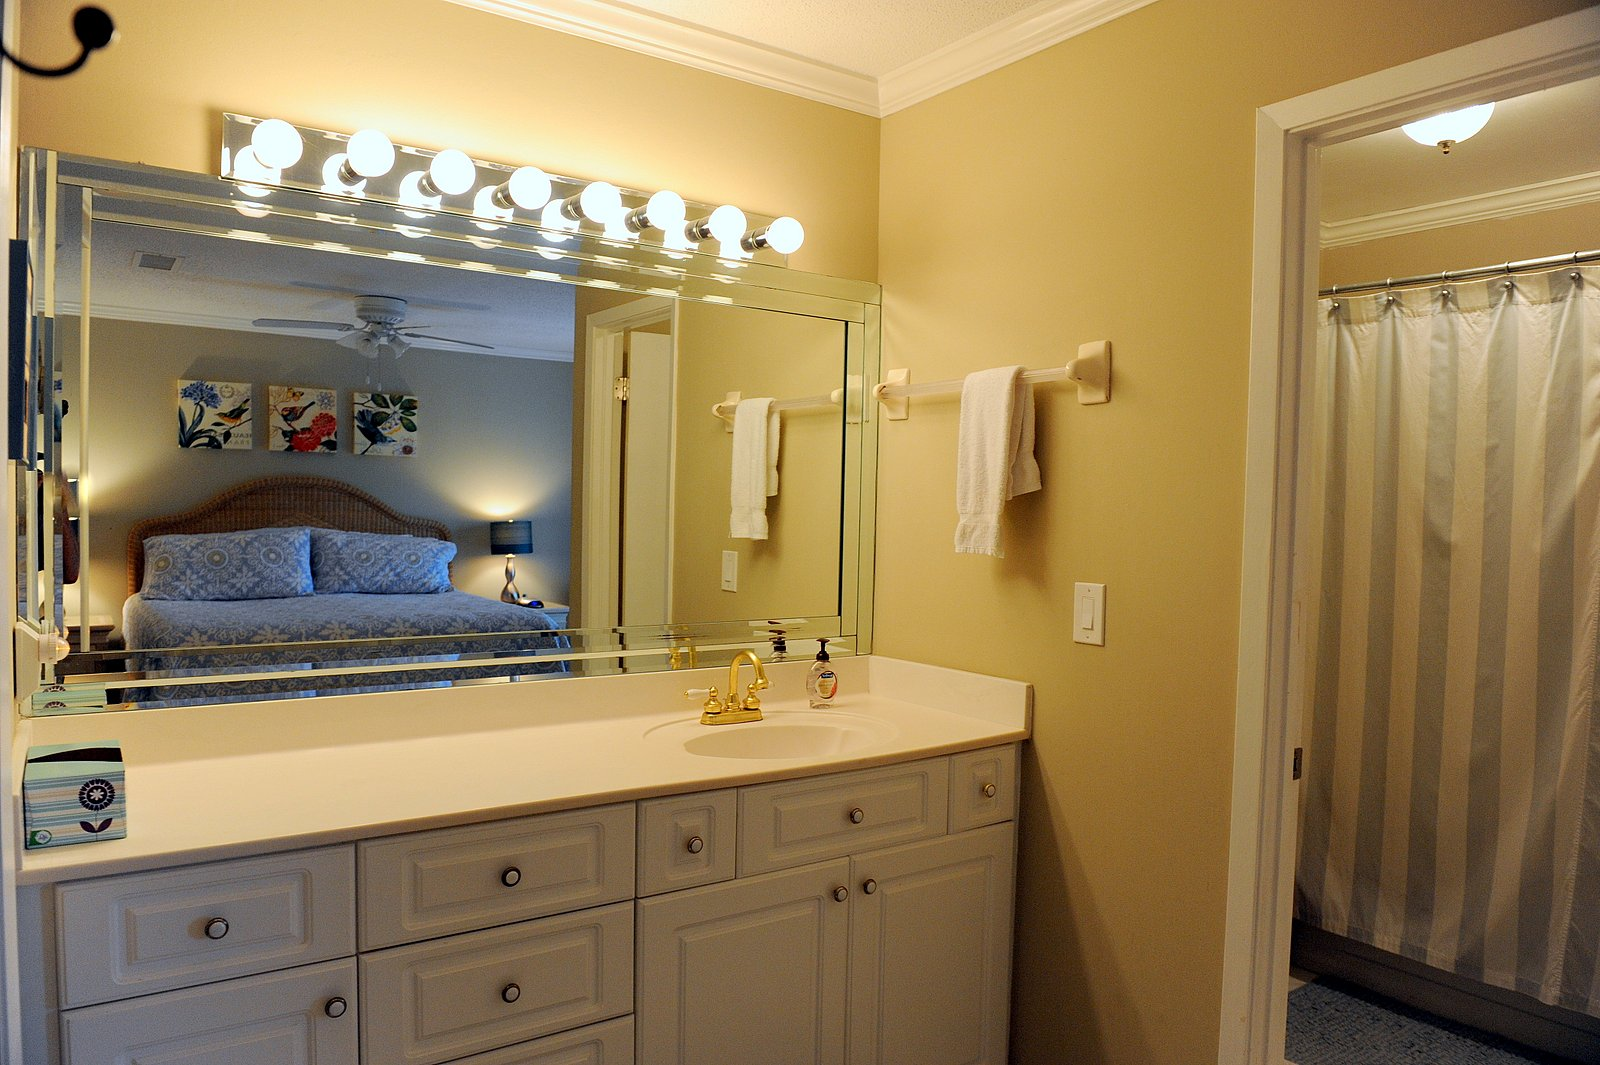 428 Linkside Condo rental in Sandestin Rentals ~ Cottages and Villas  in Destin Florida - #15